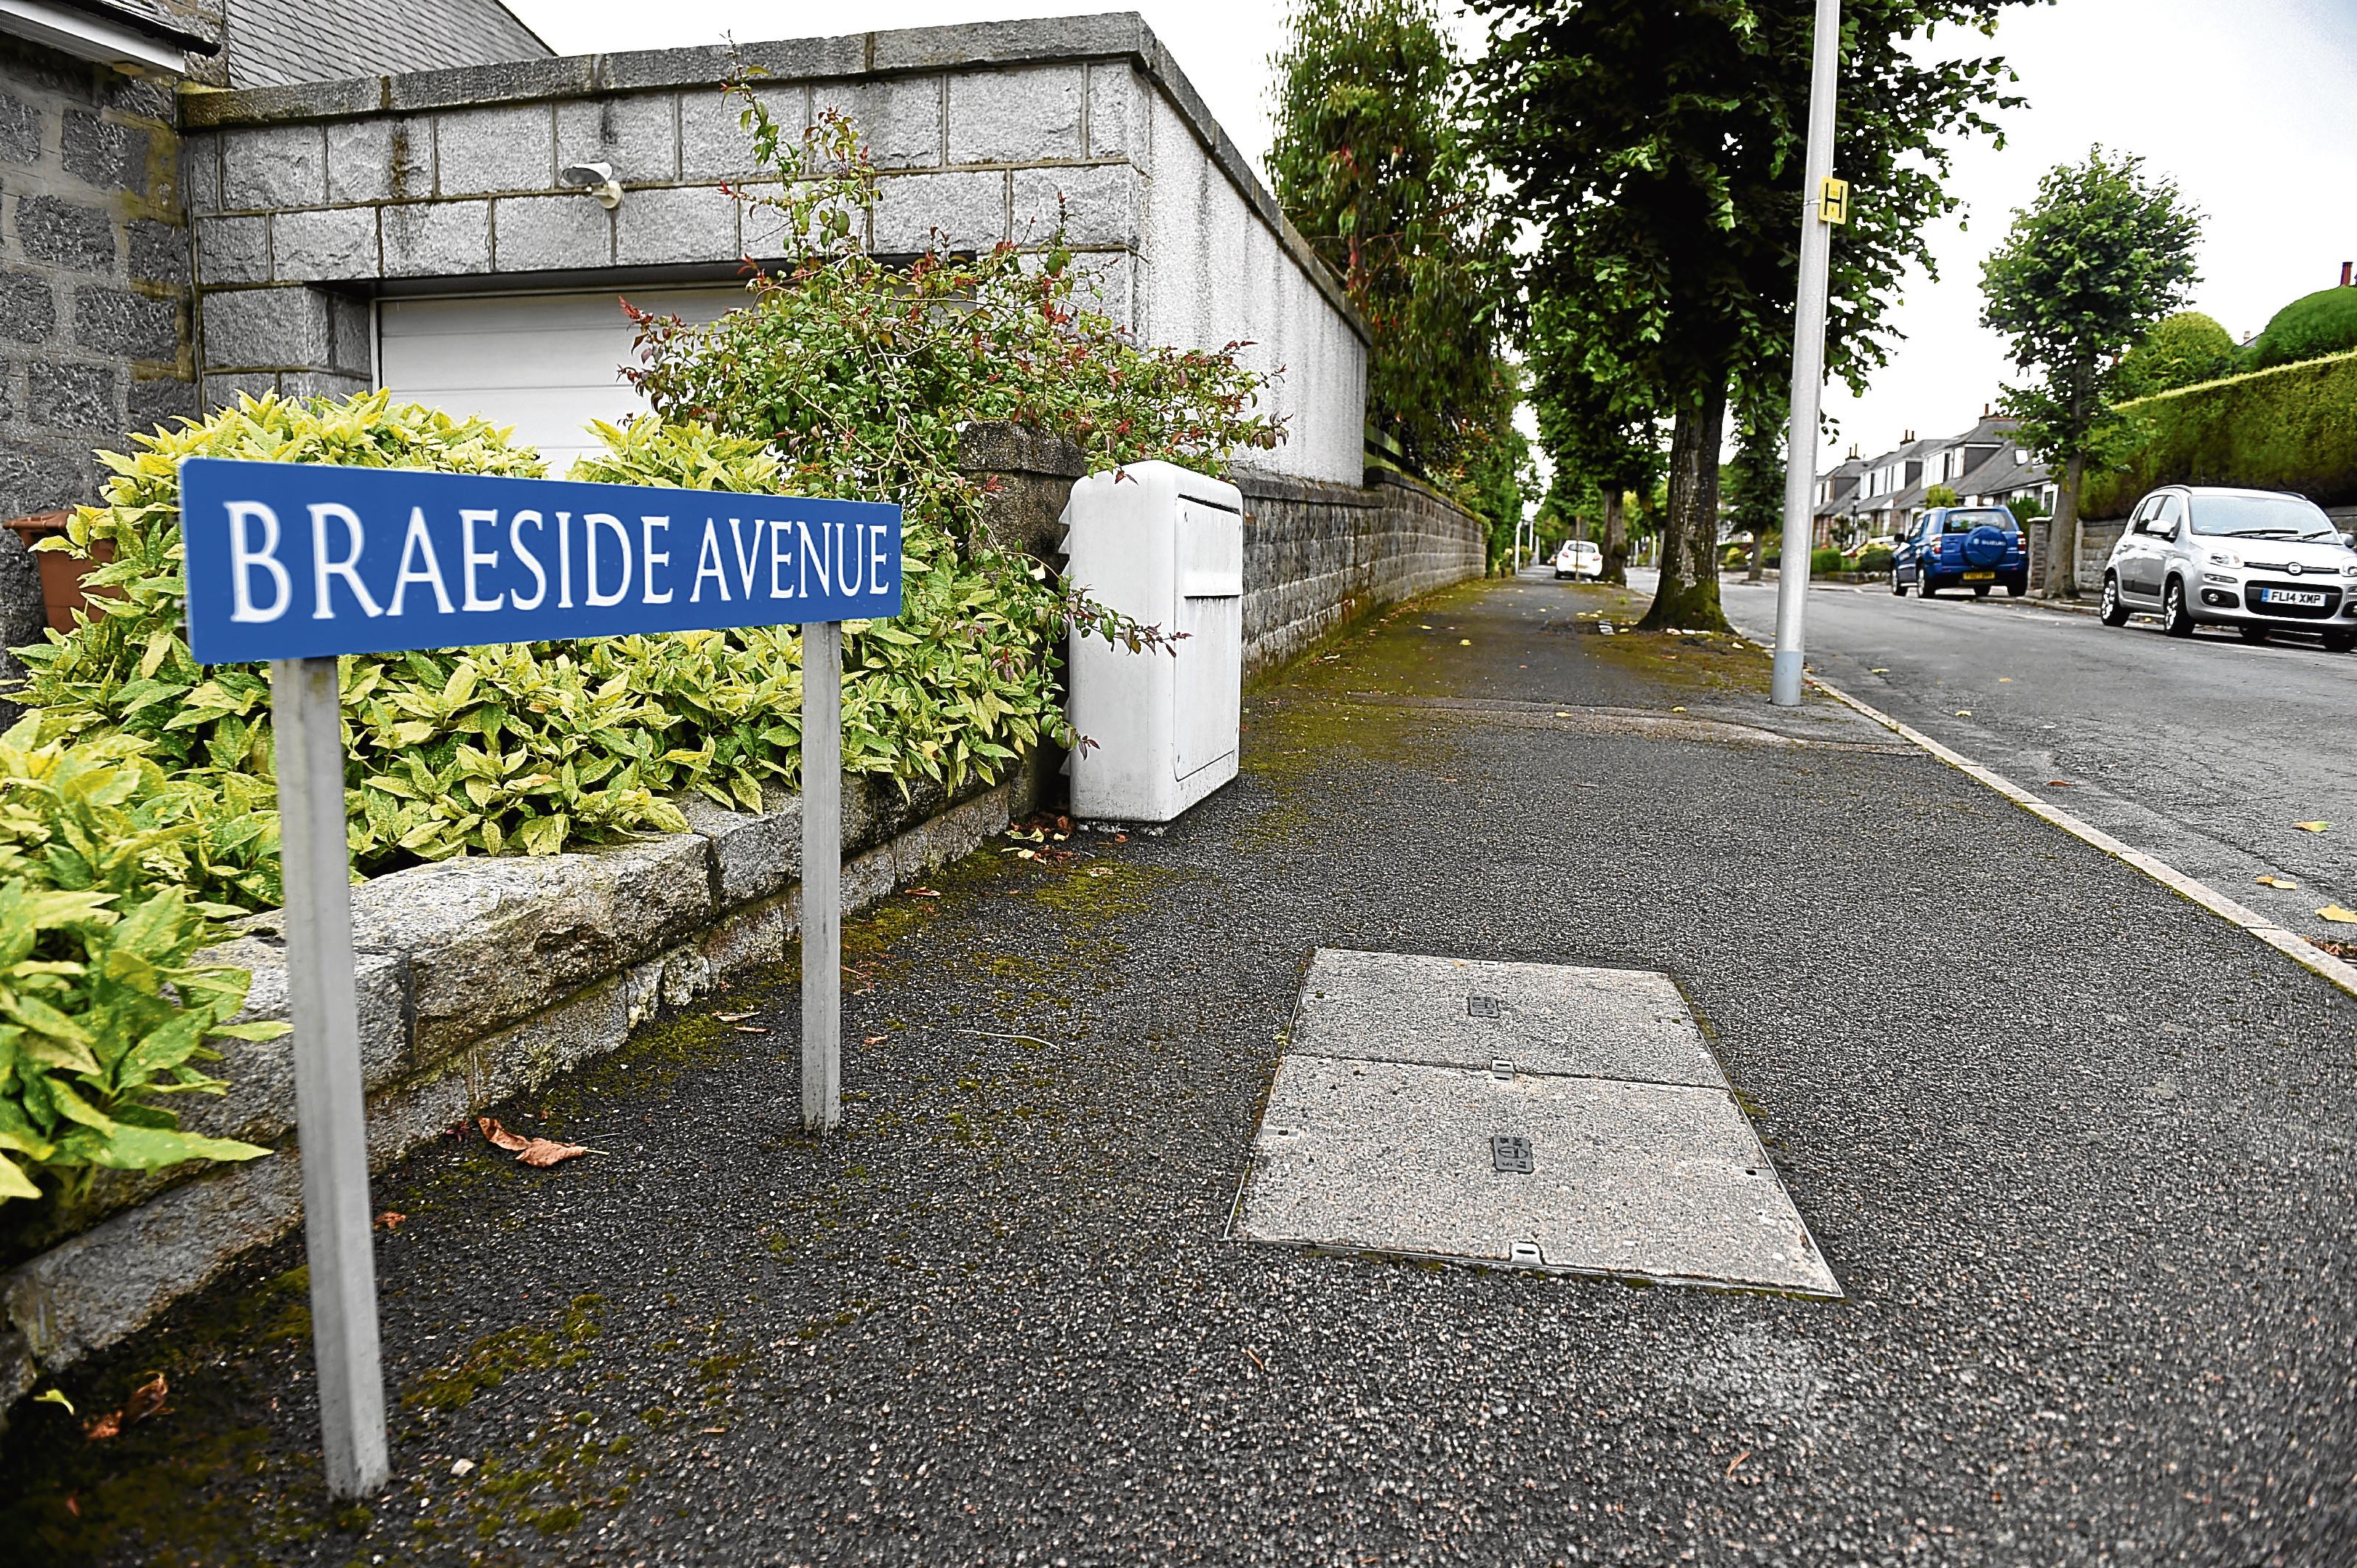 Braeside Avenue, Aberdeen. Picture by DARRELL BENNS